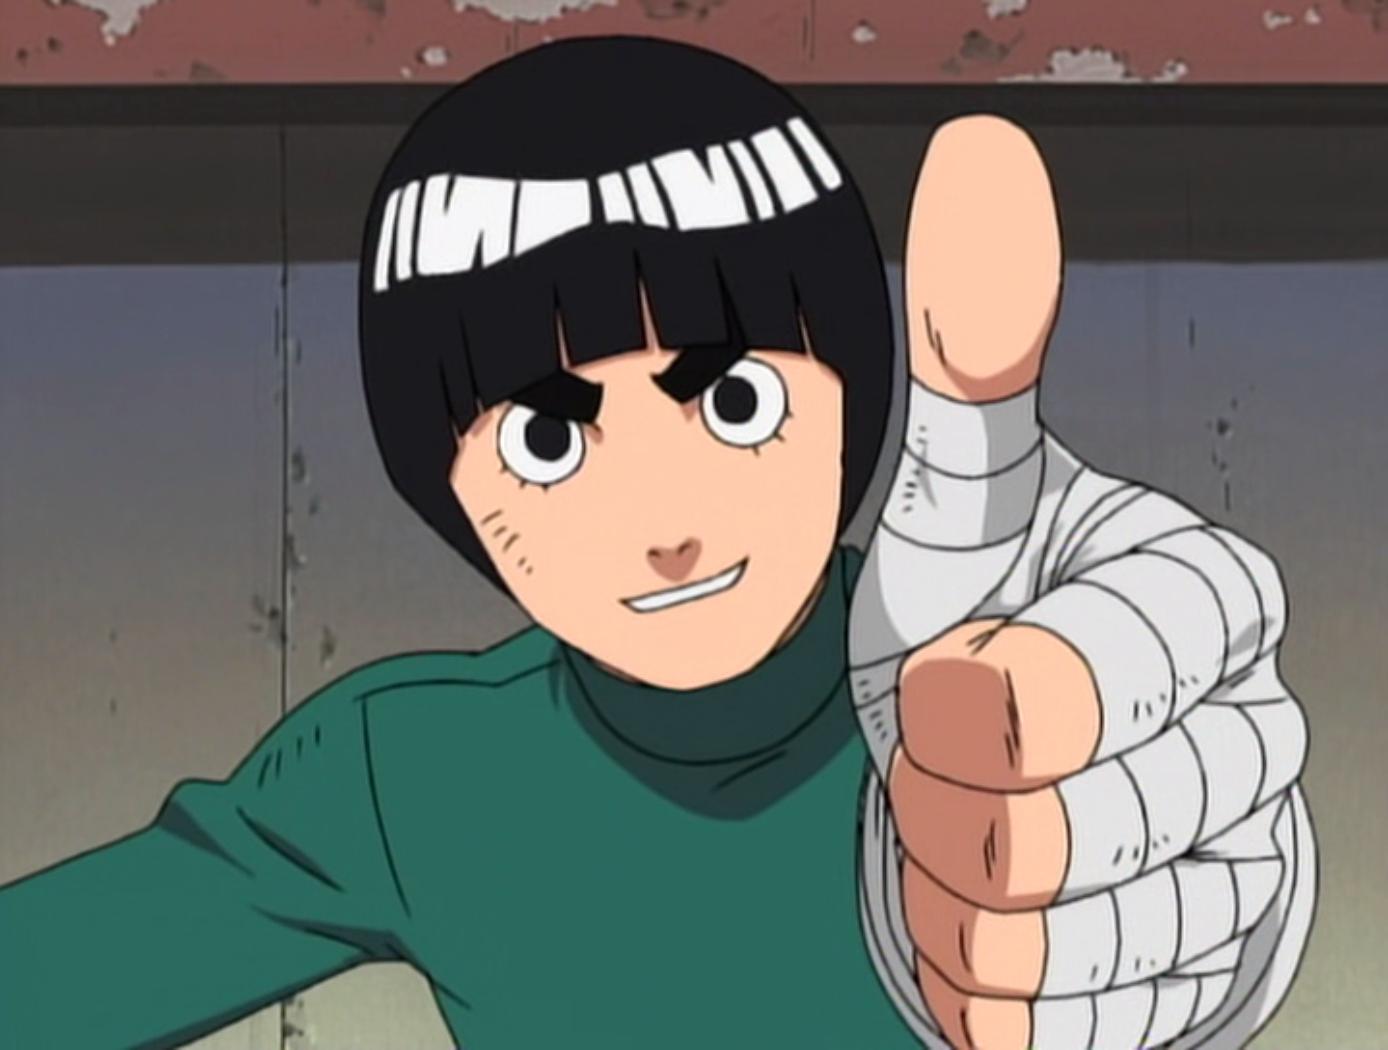 manga - Avis final sur le manga Naruto.  Lee_Pose